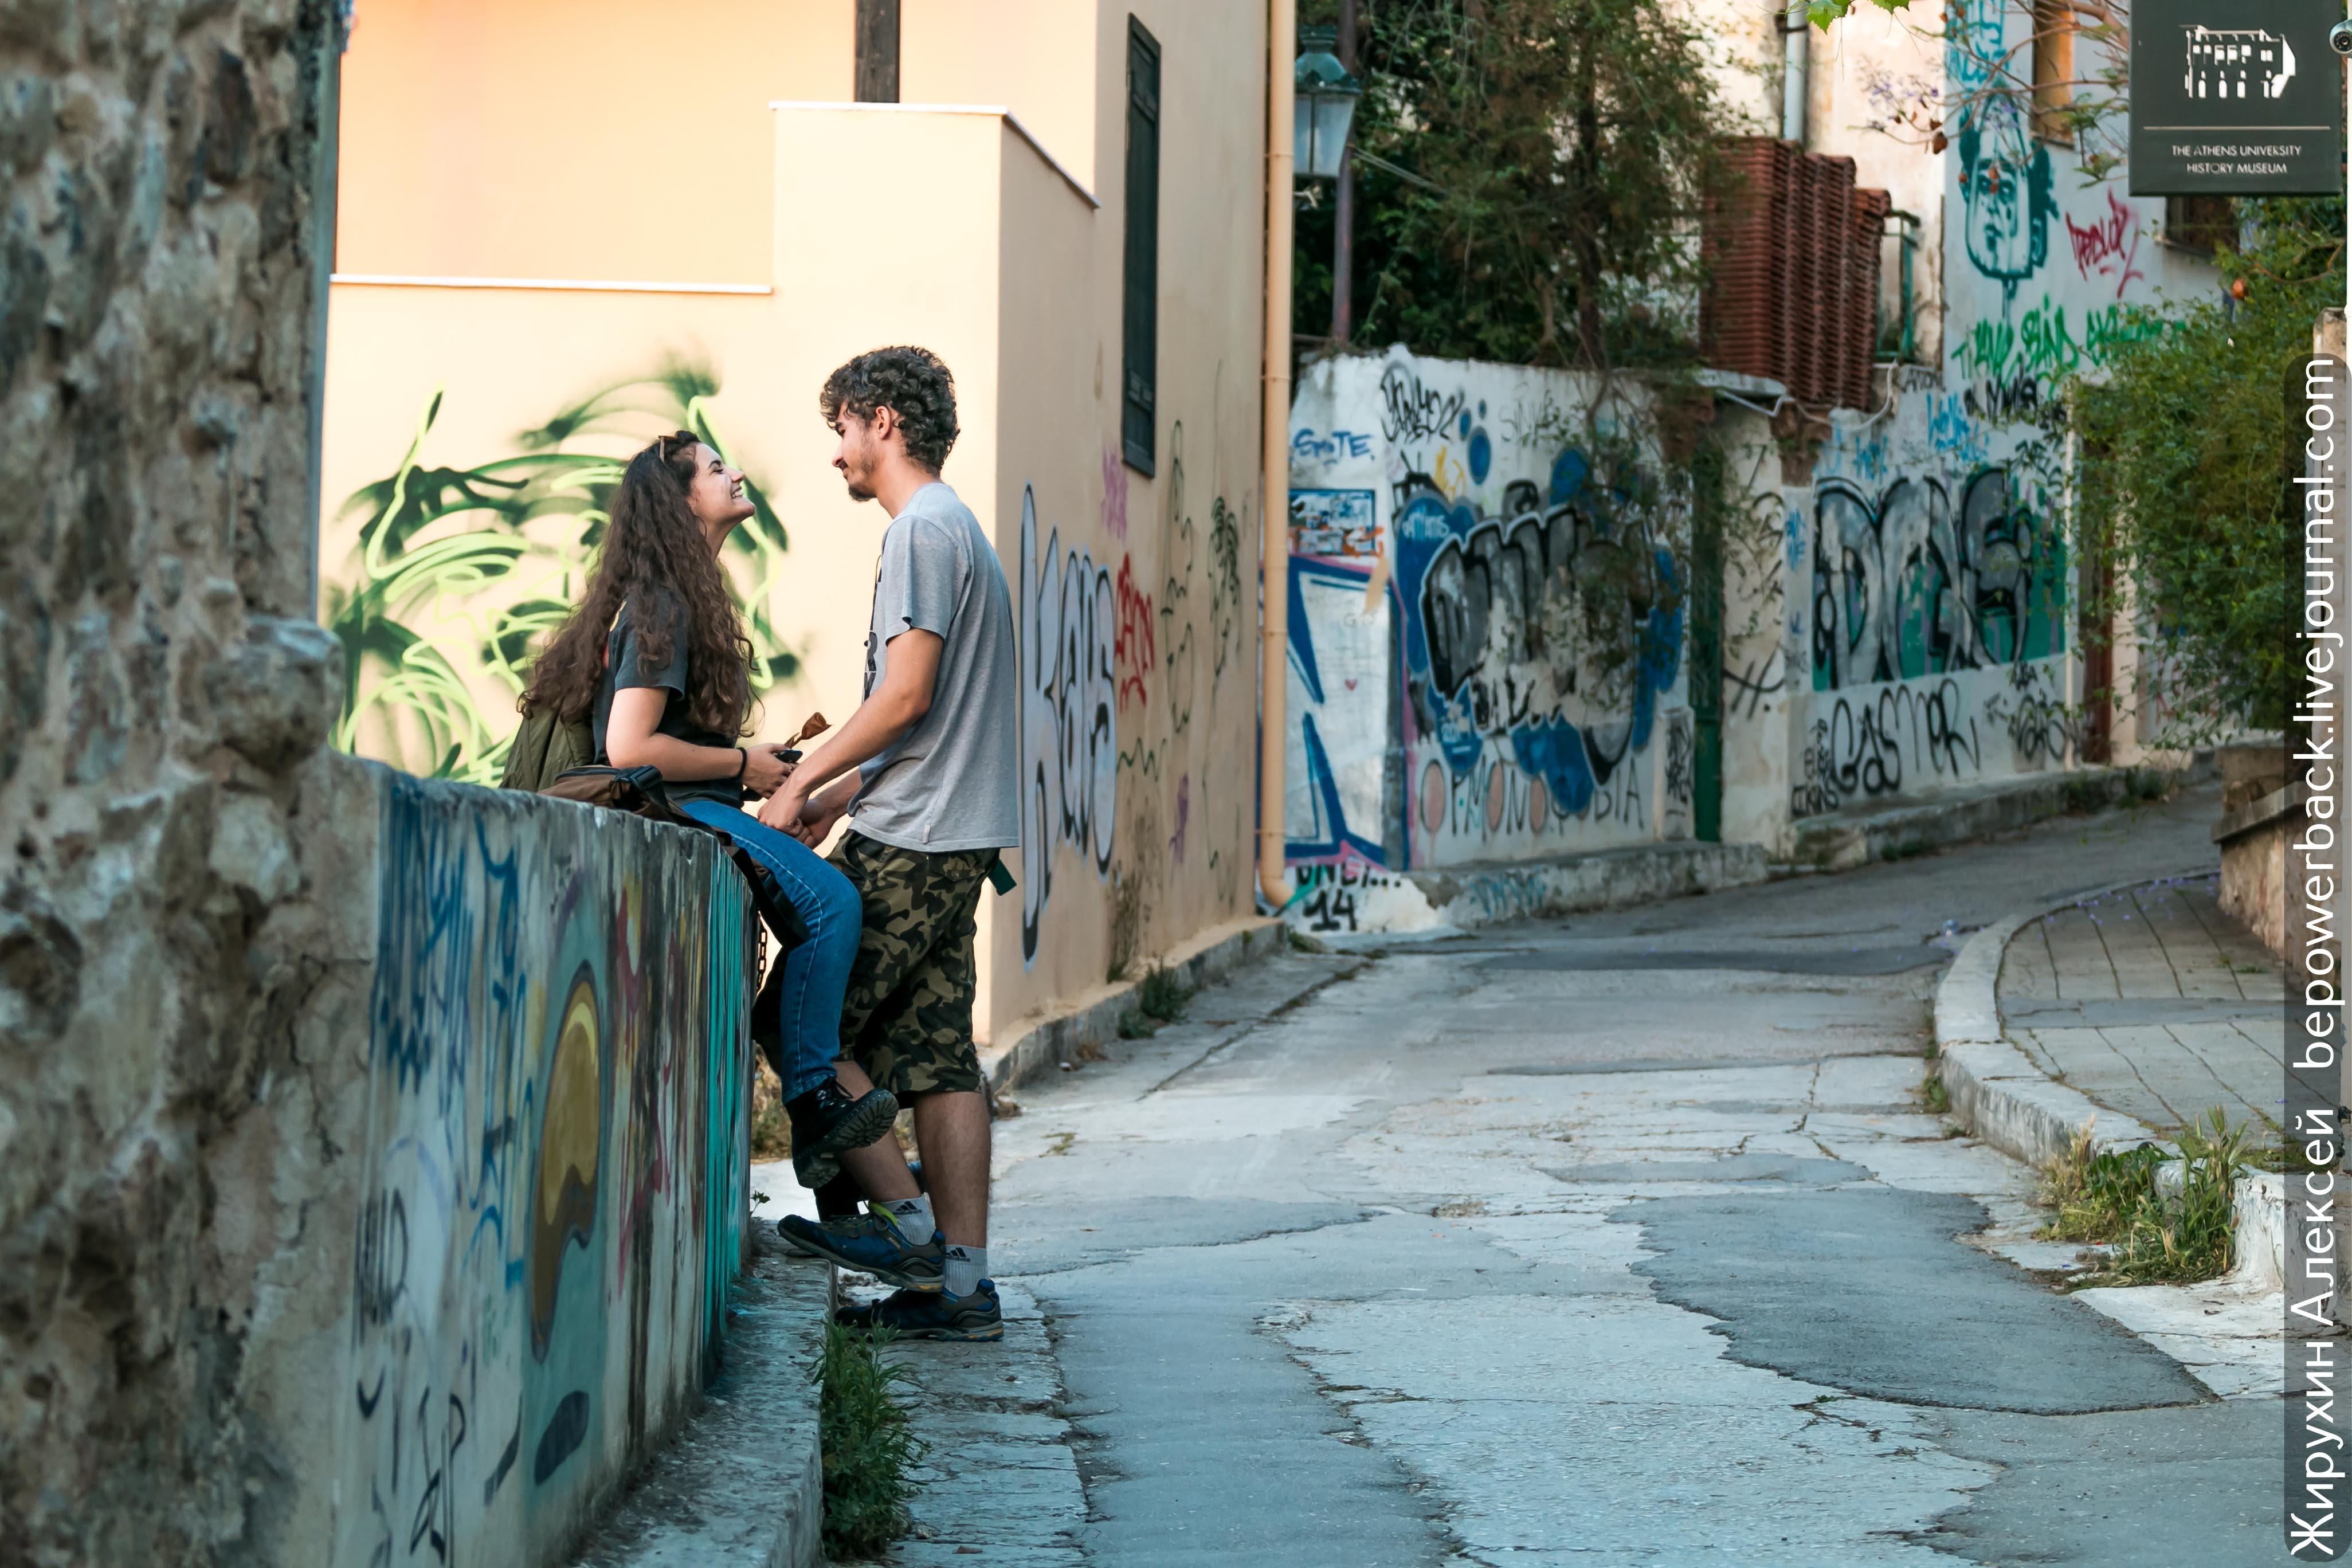 кавказа сайт знакомств славянск на кубани мужики